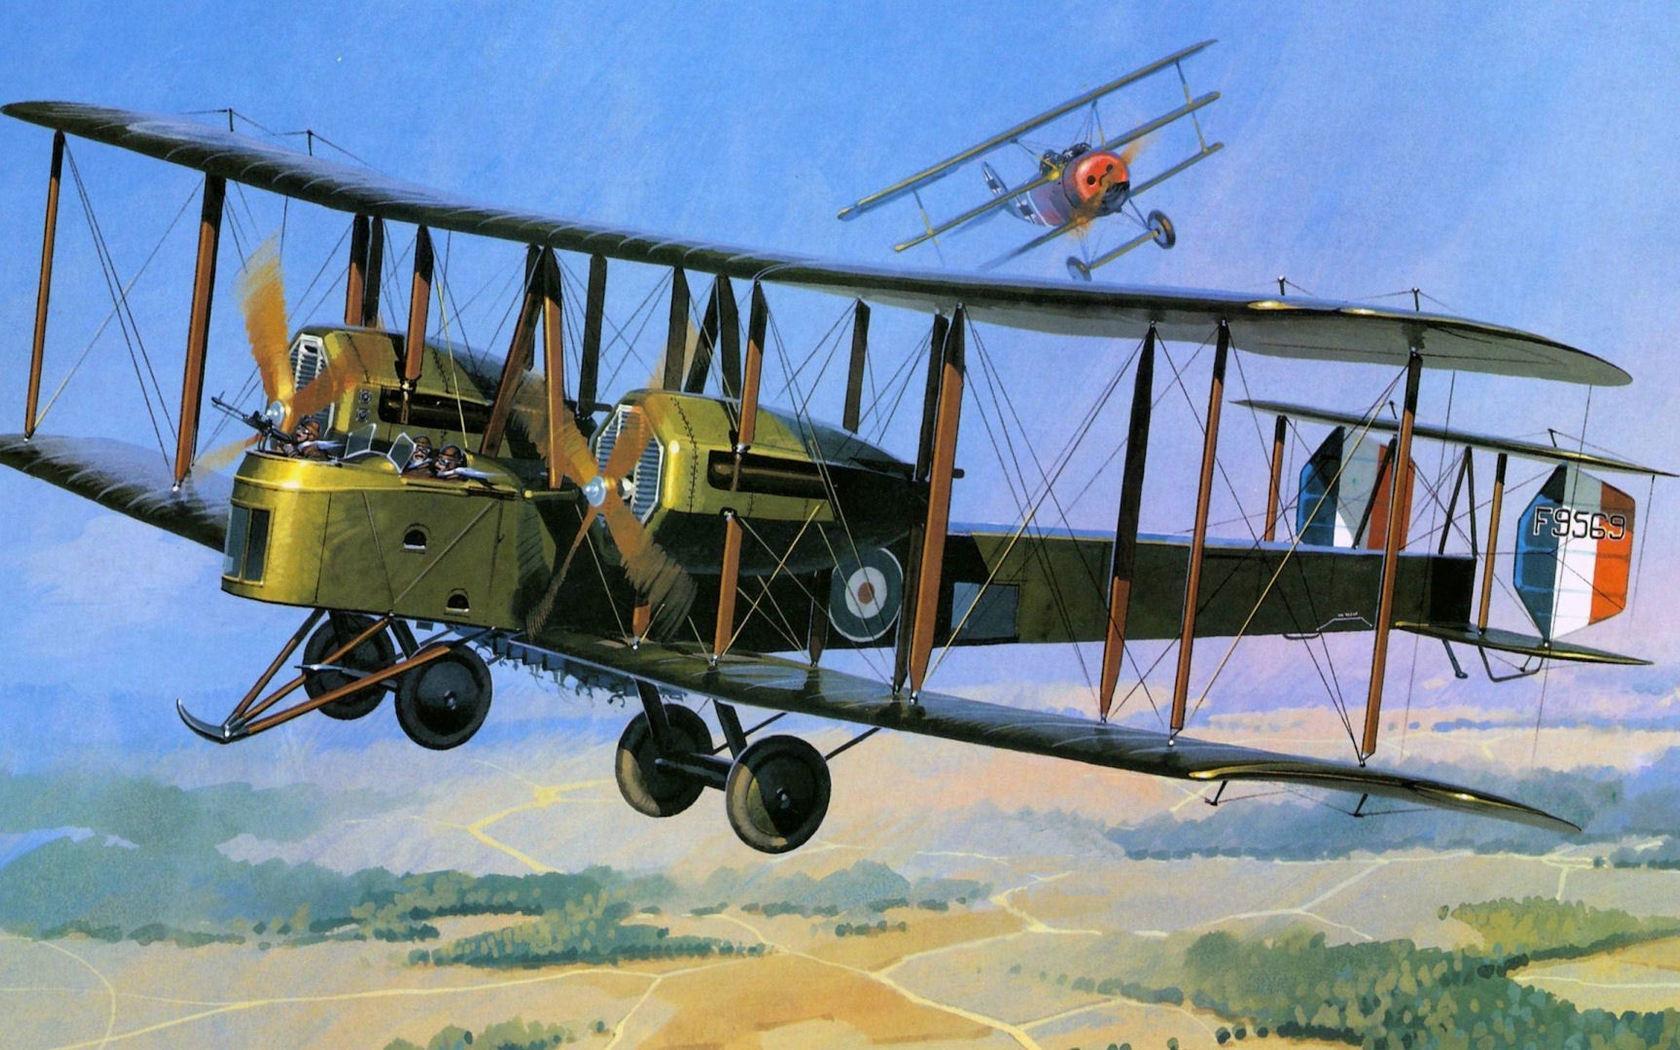 Biplane wallpapers HD quality